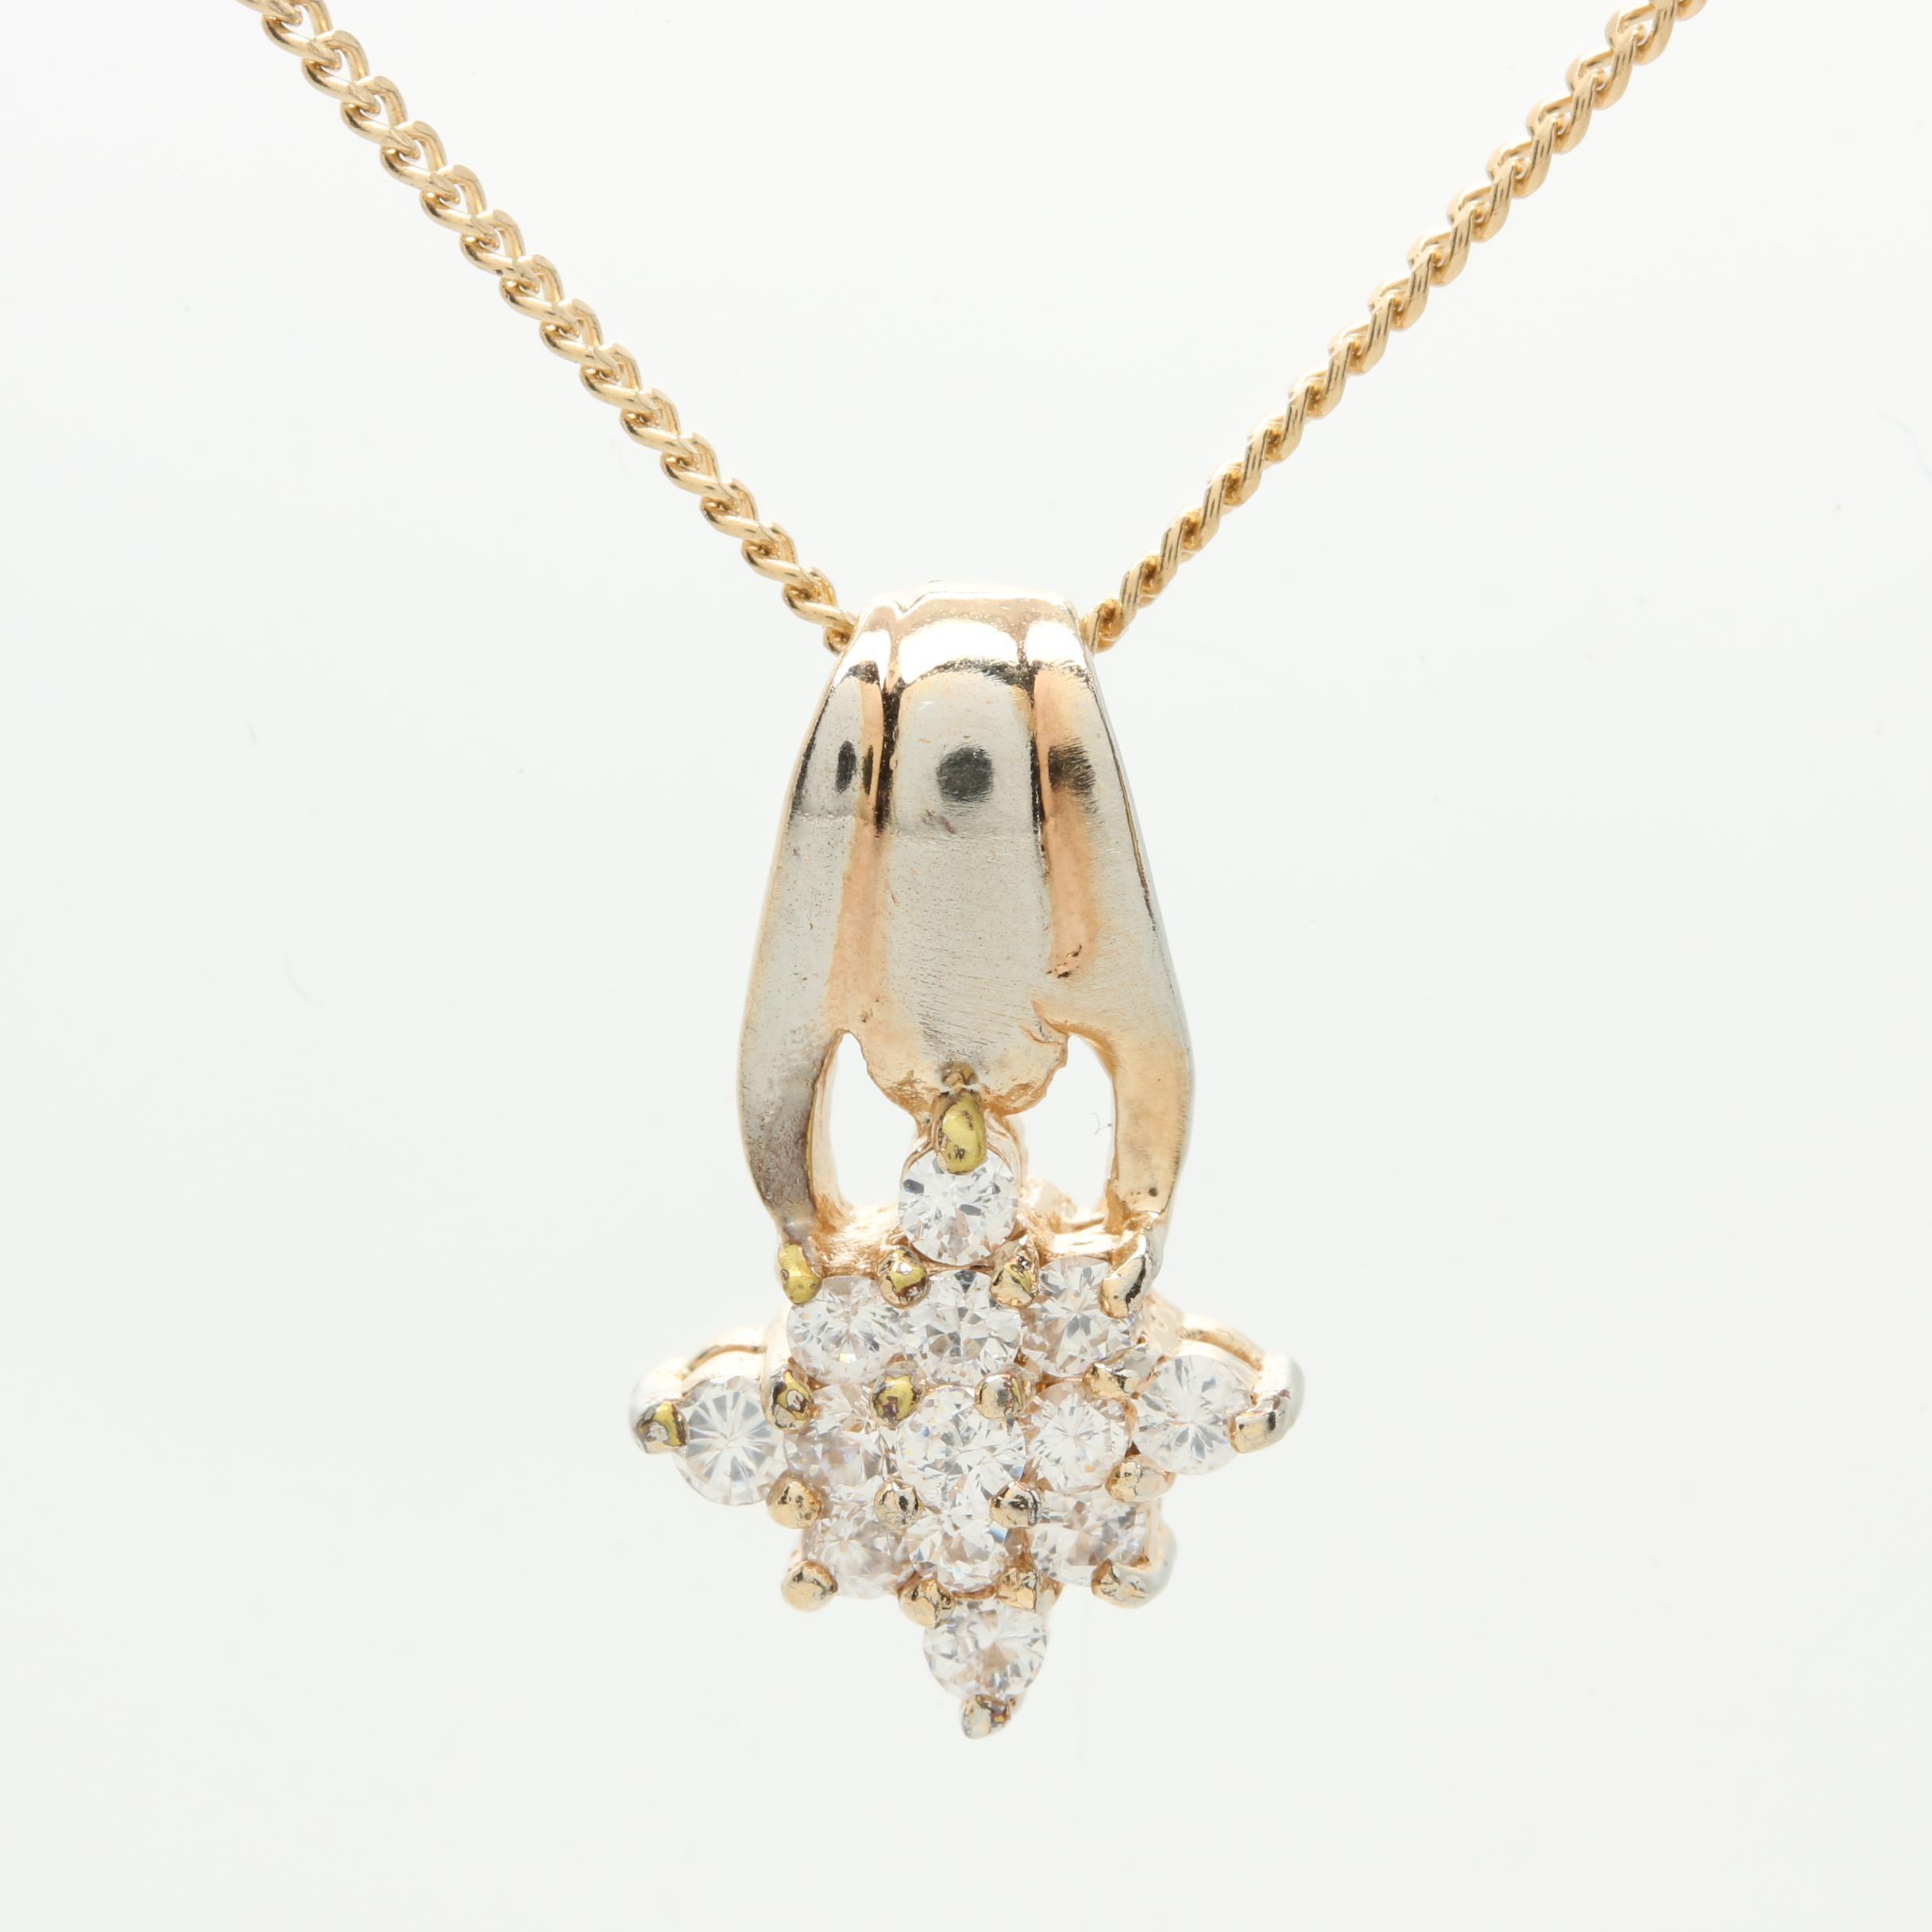 Gold Tone Metal Cubic Zirconia Star Burst Necklace